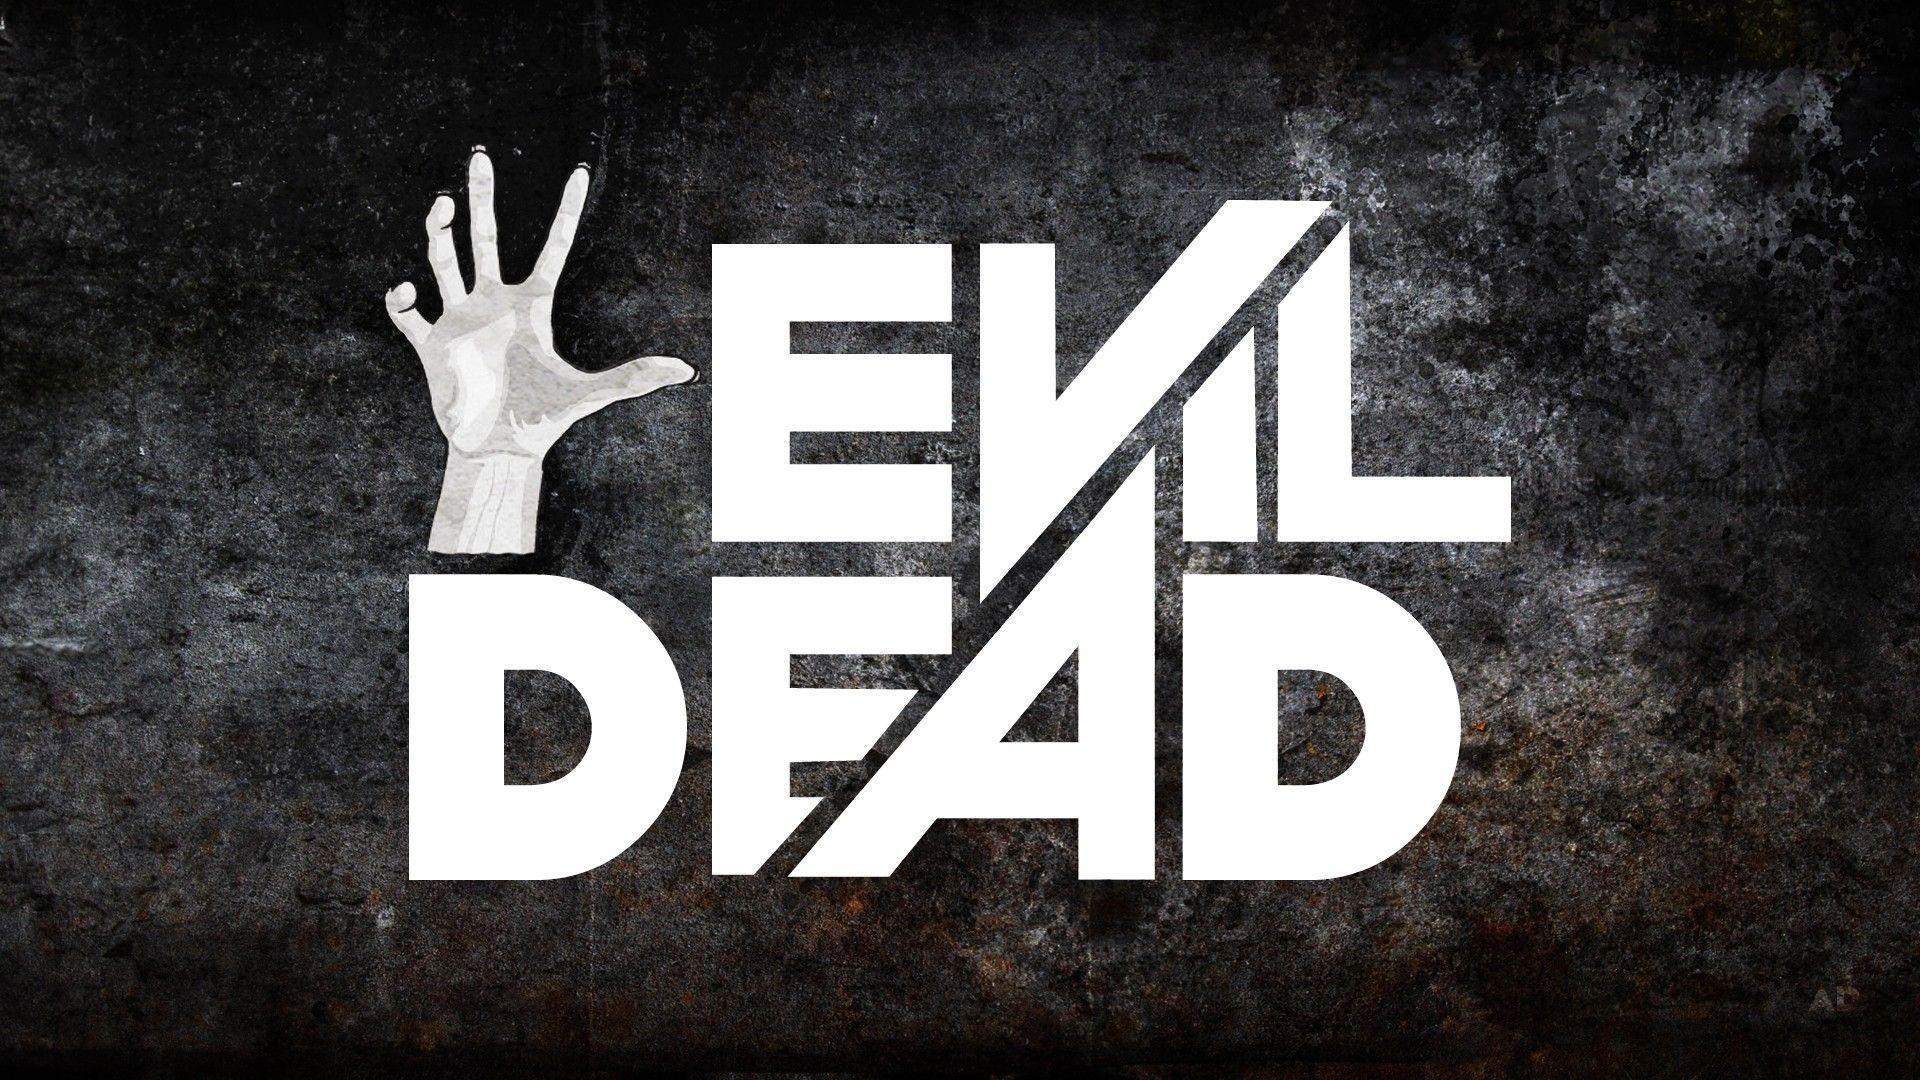 Evil Dead 2013 HD Wallpaper   Movies Wallpapers